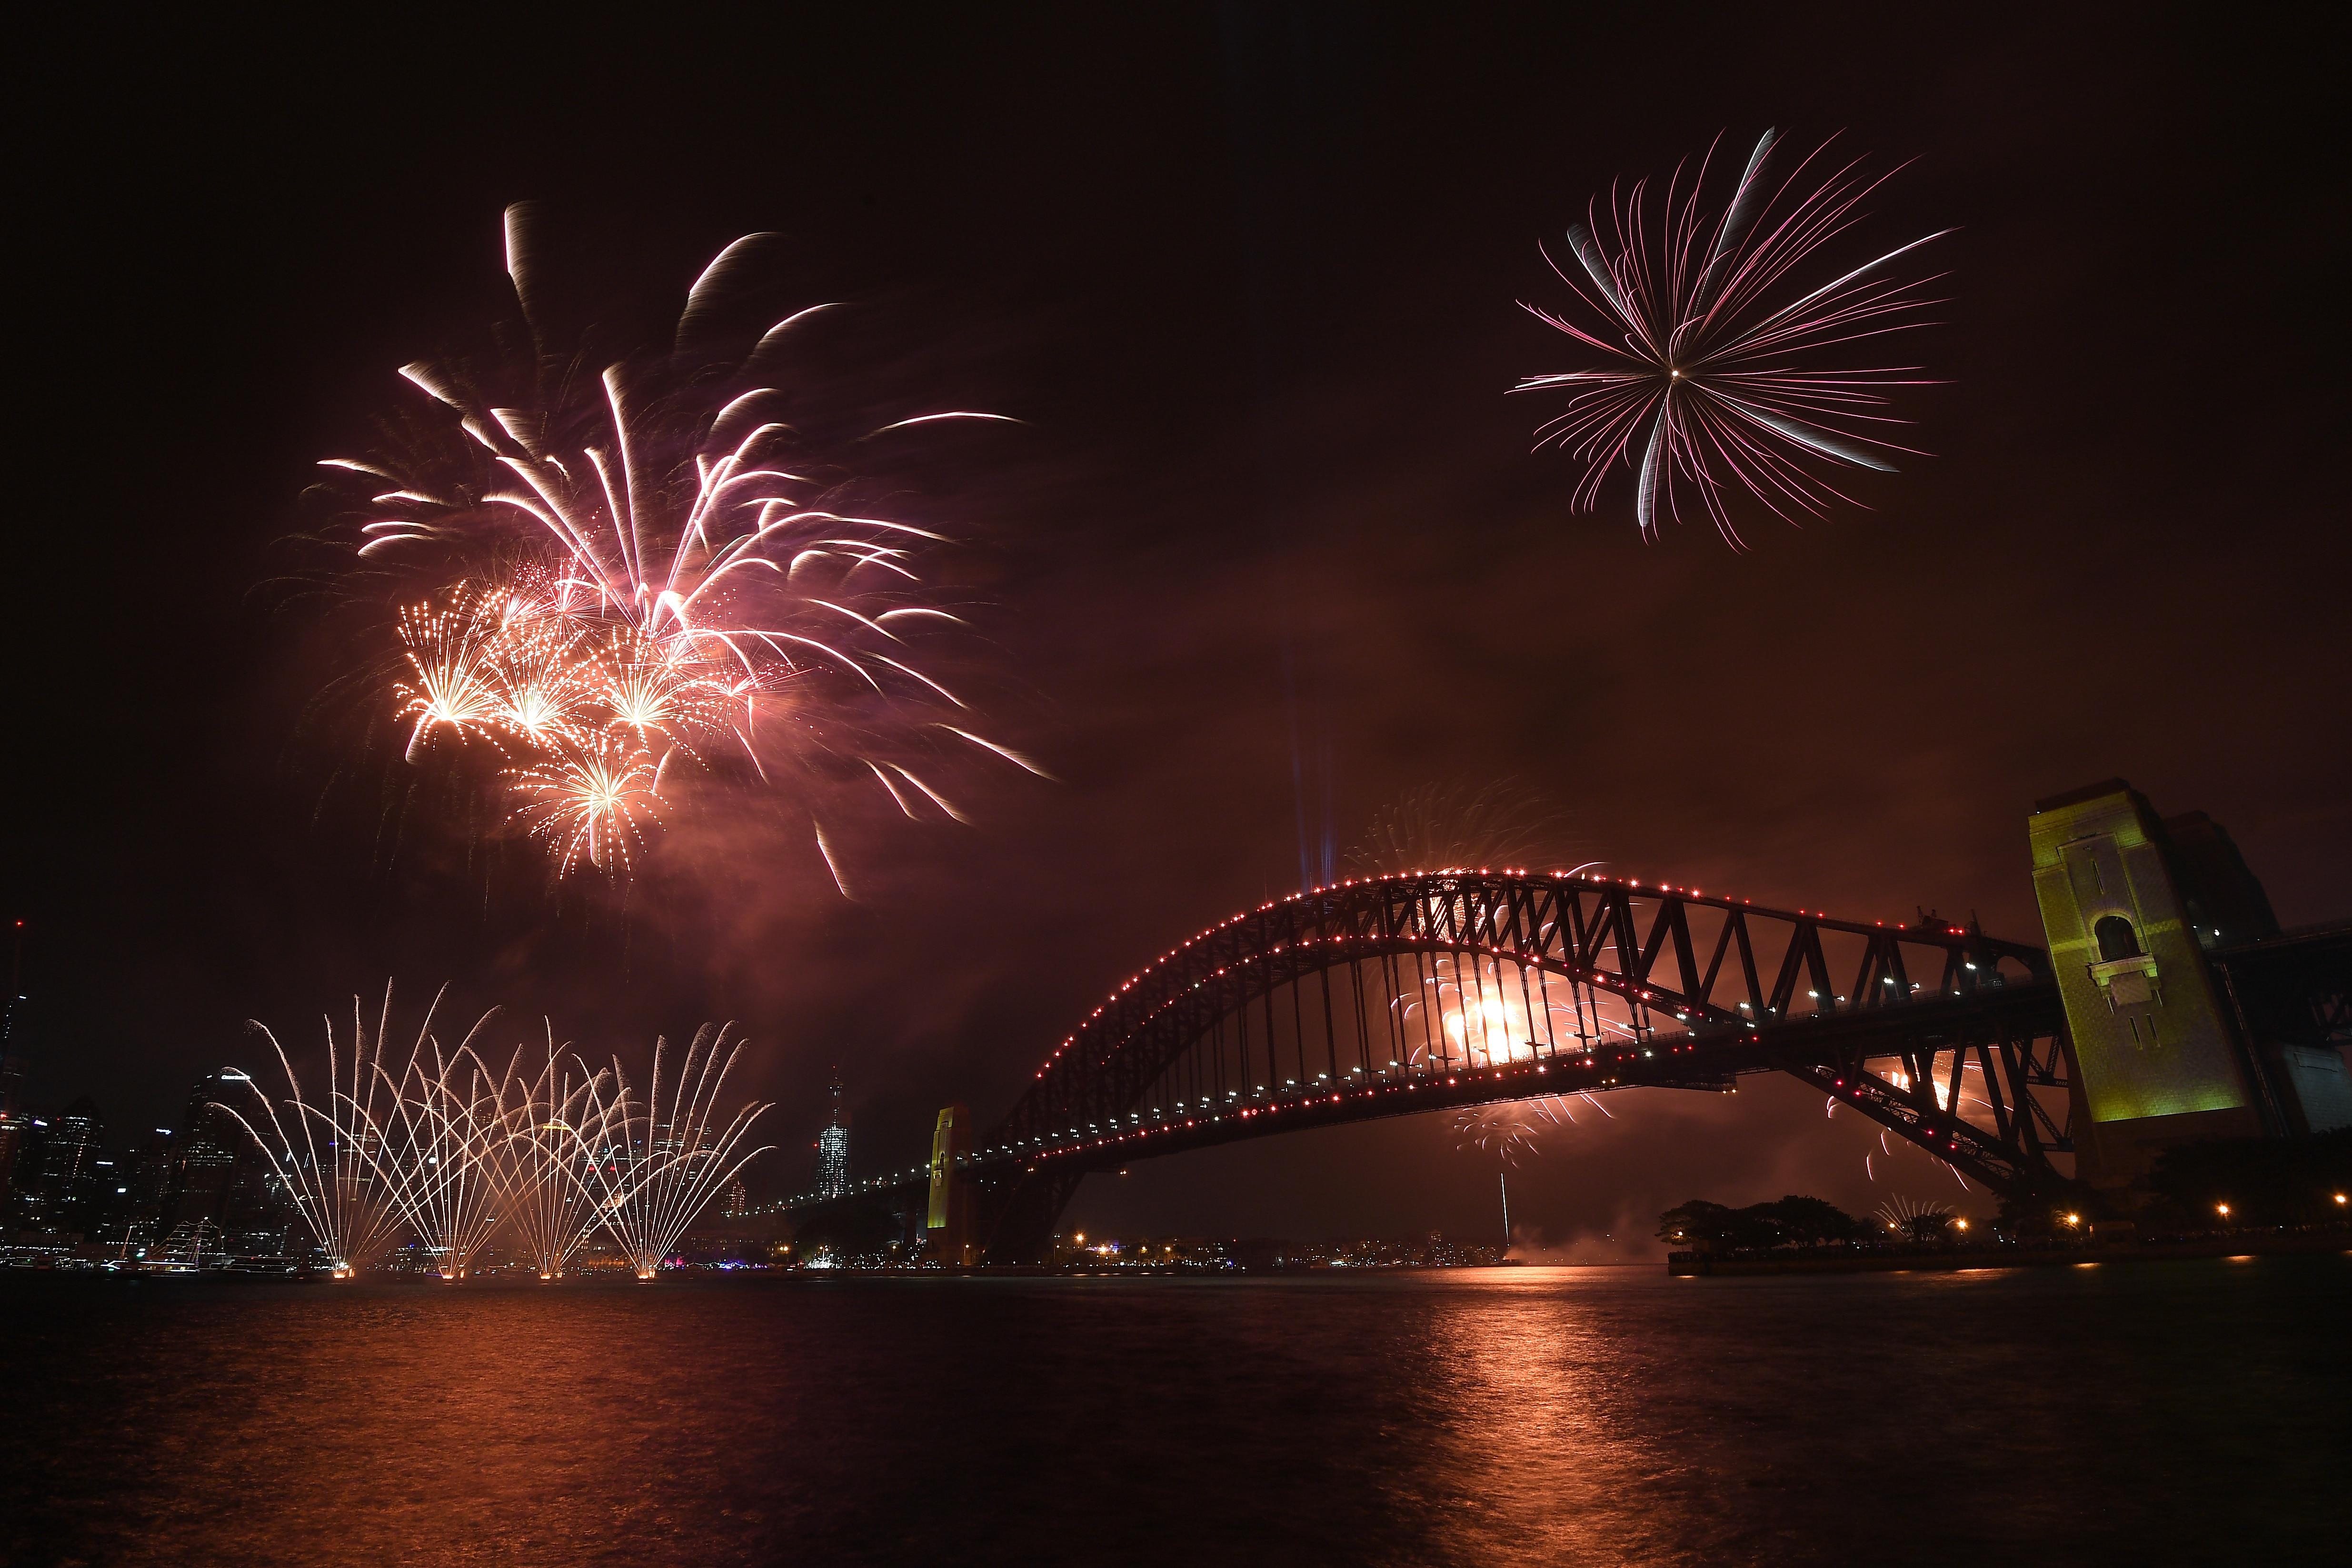 Fireworks explode above the Sydney Harbour Bridge.